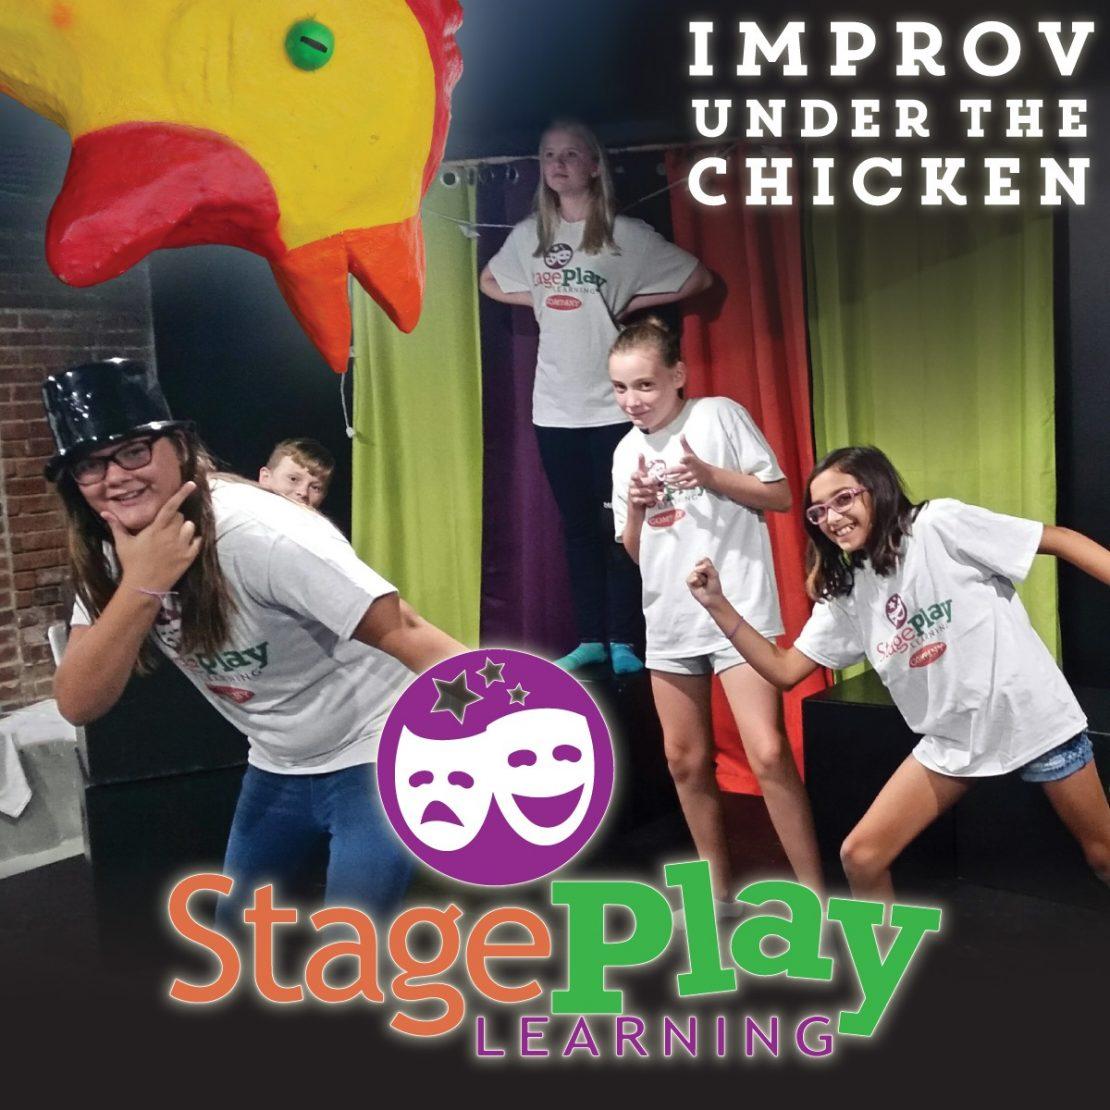 05-23-19-stageplay-improv-chicken-sq